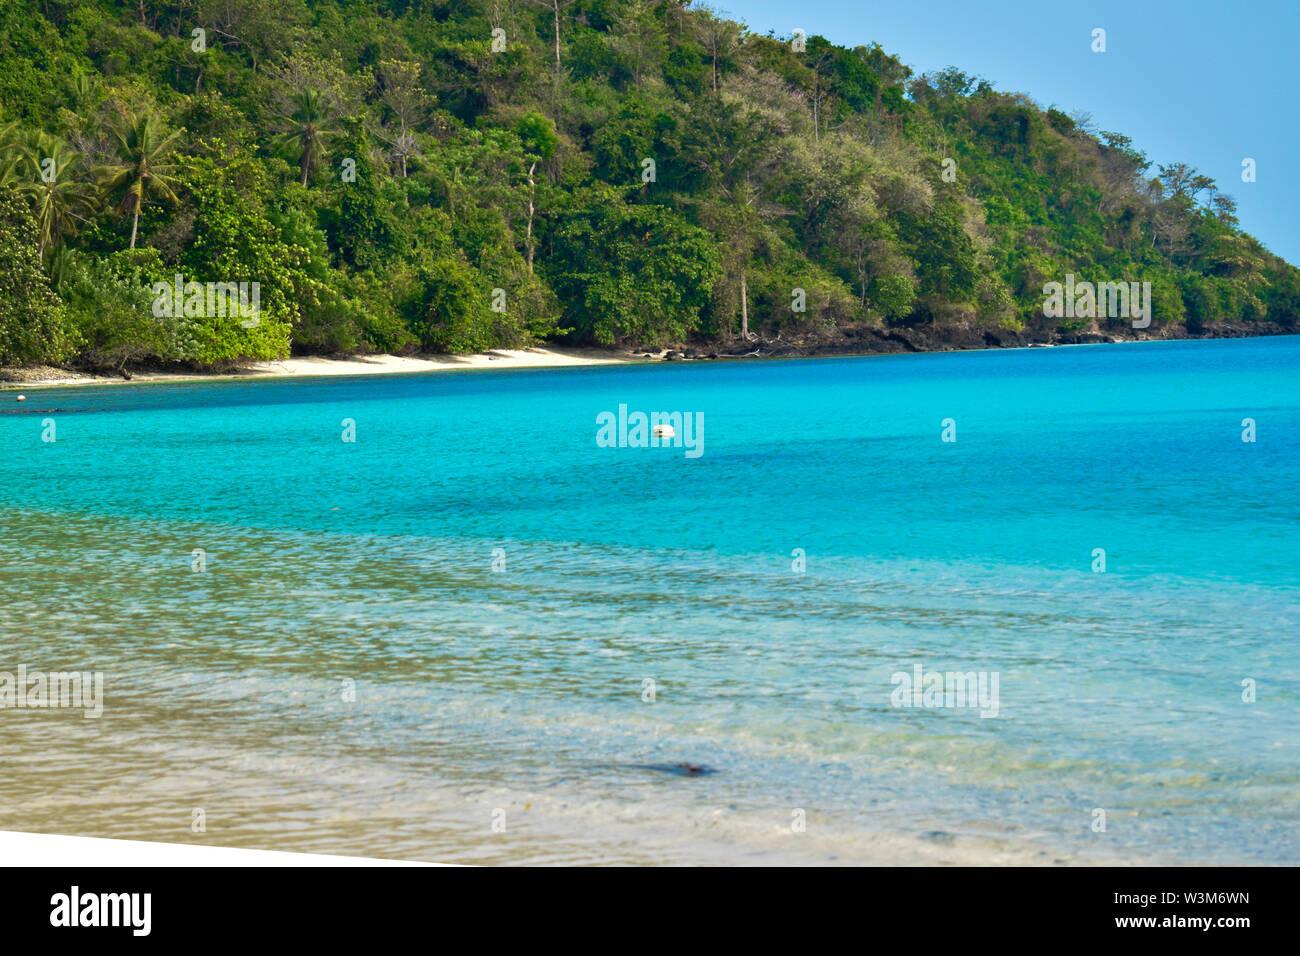 Beautiful landscape in the Indonesia, Lampung Ocean Coastline - Stock Image